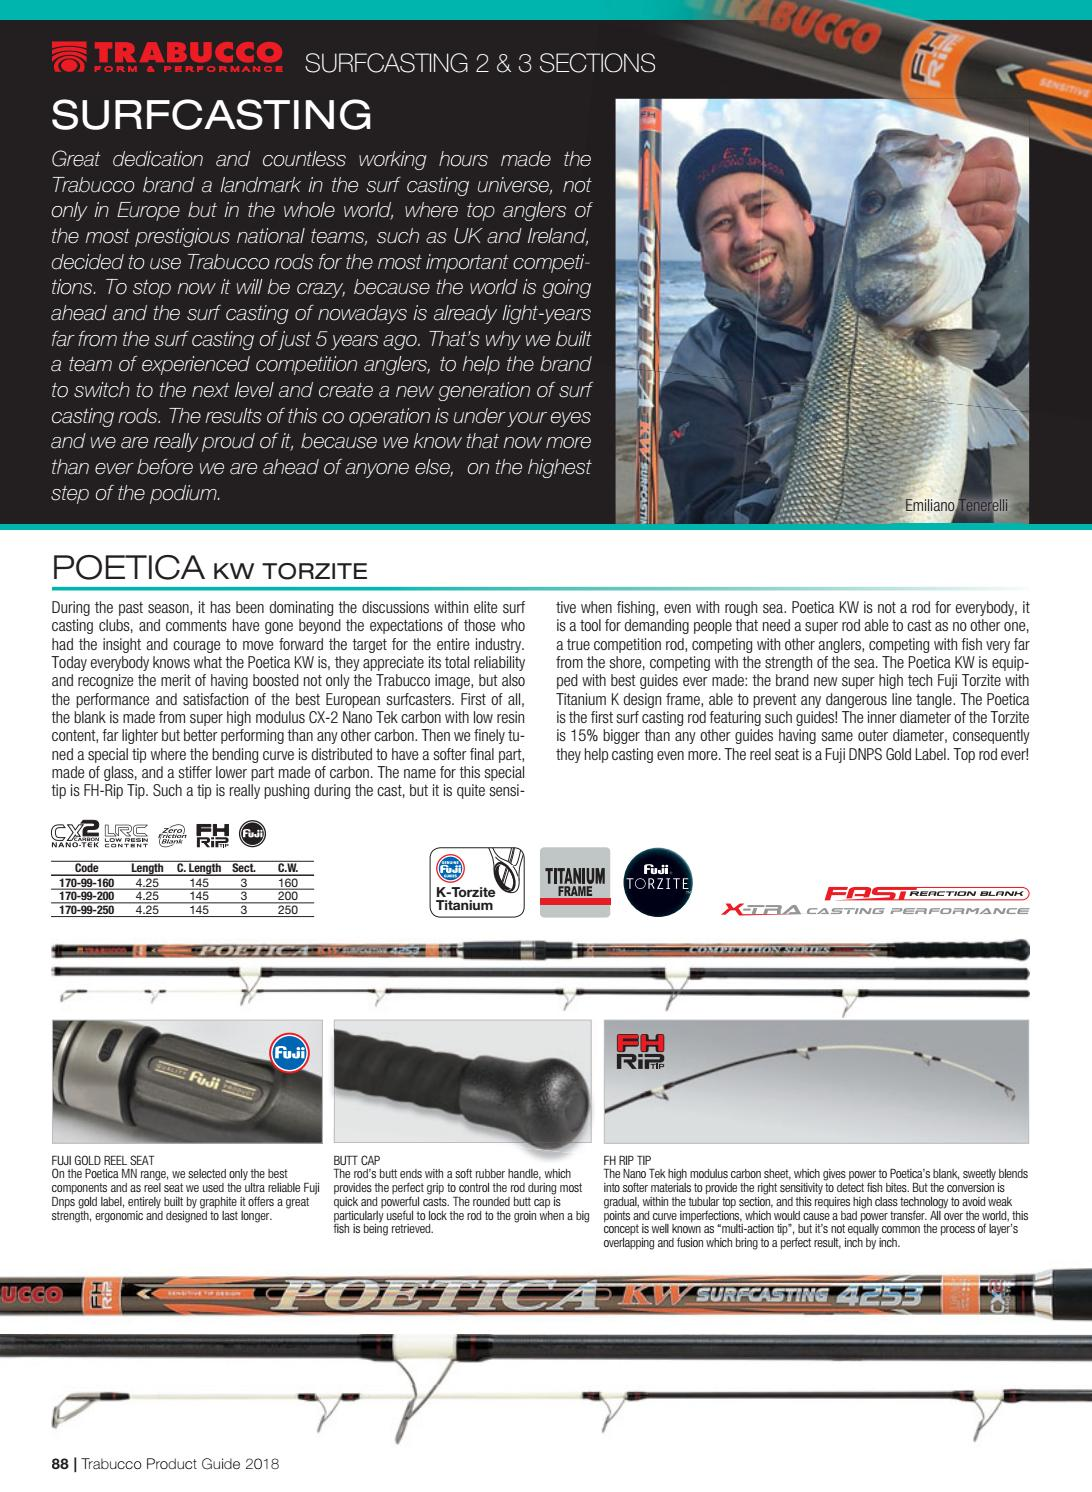 Trabucco Fishing Catalog 2018 - Fishing tackle by Trabucco